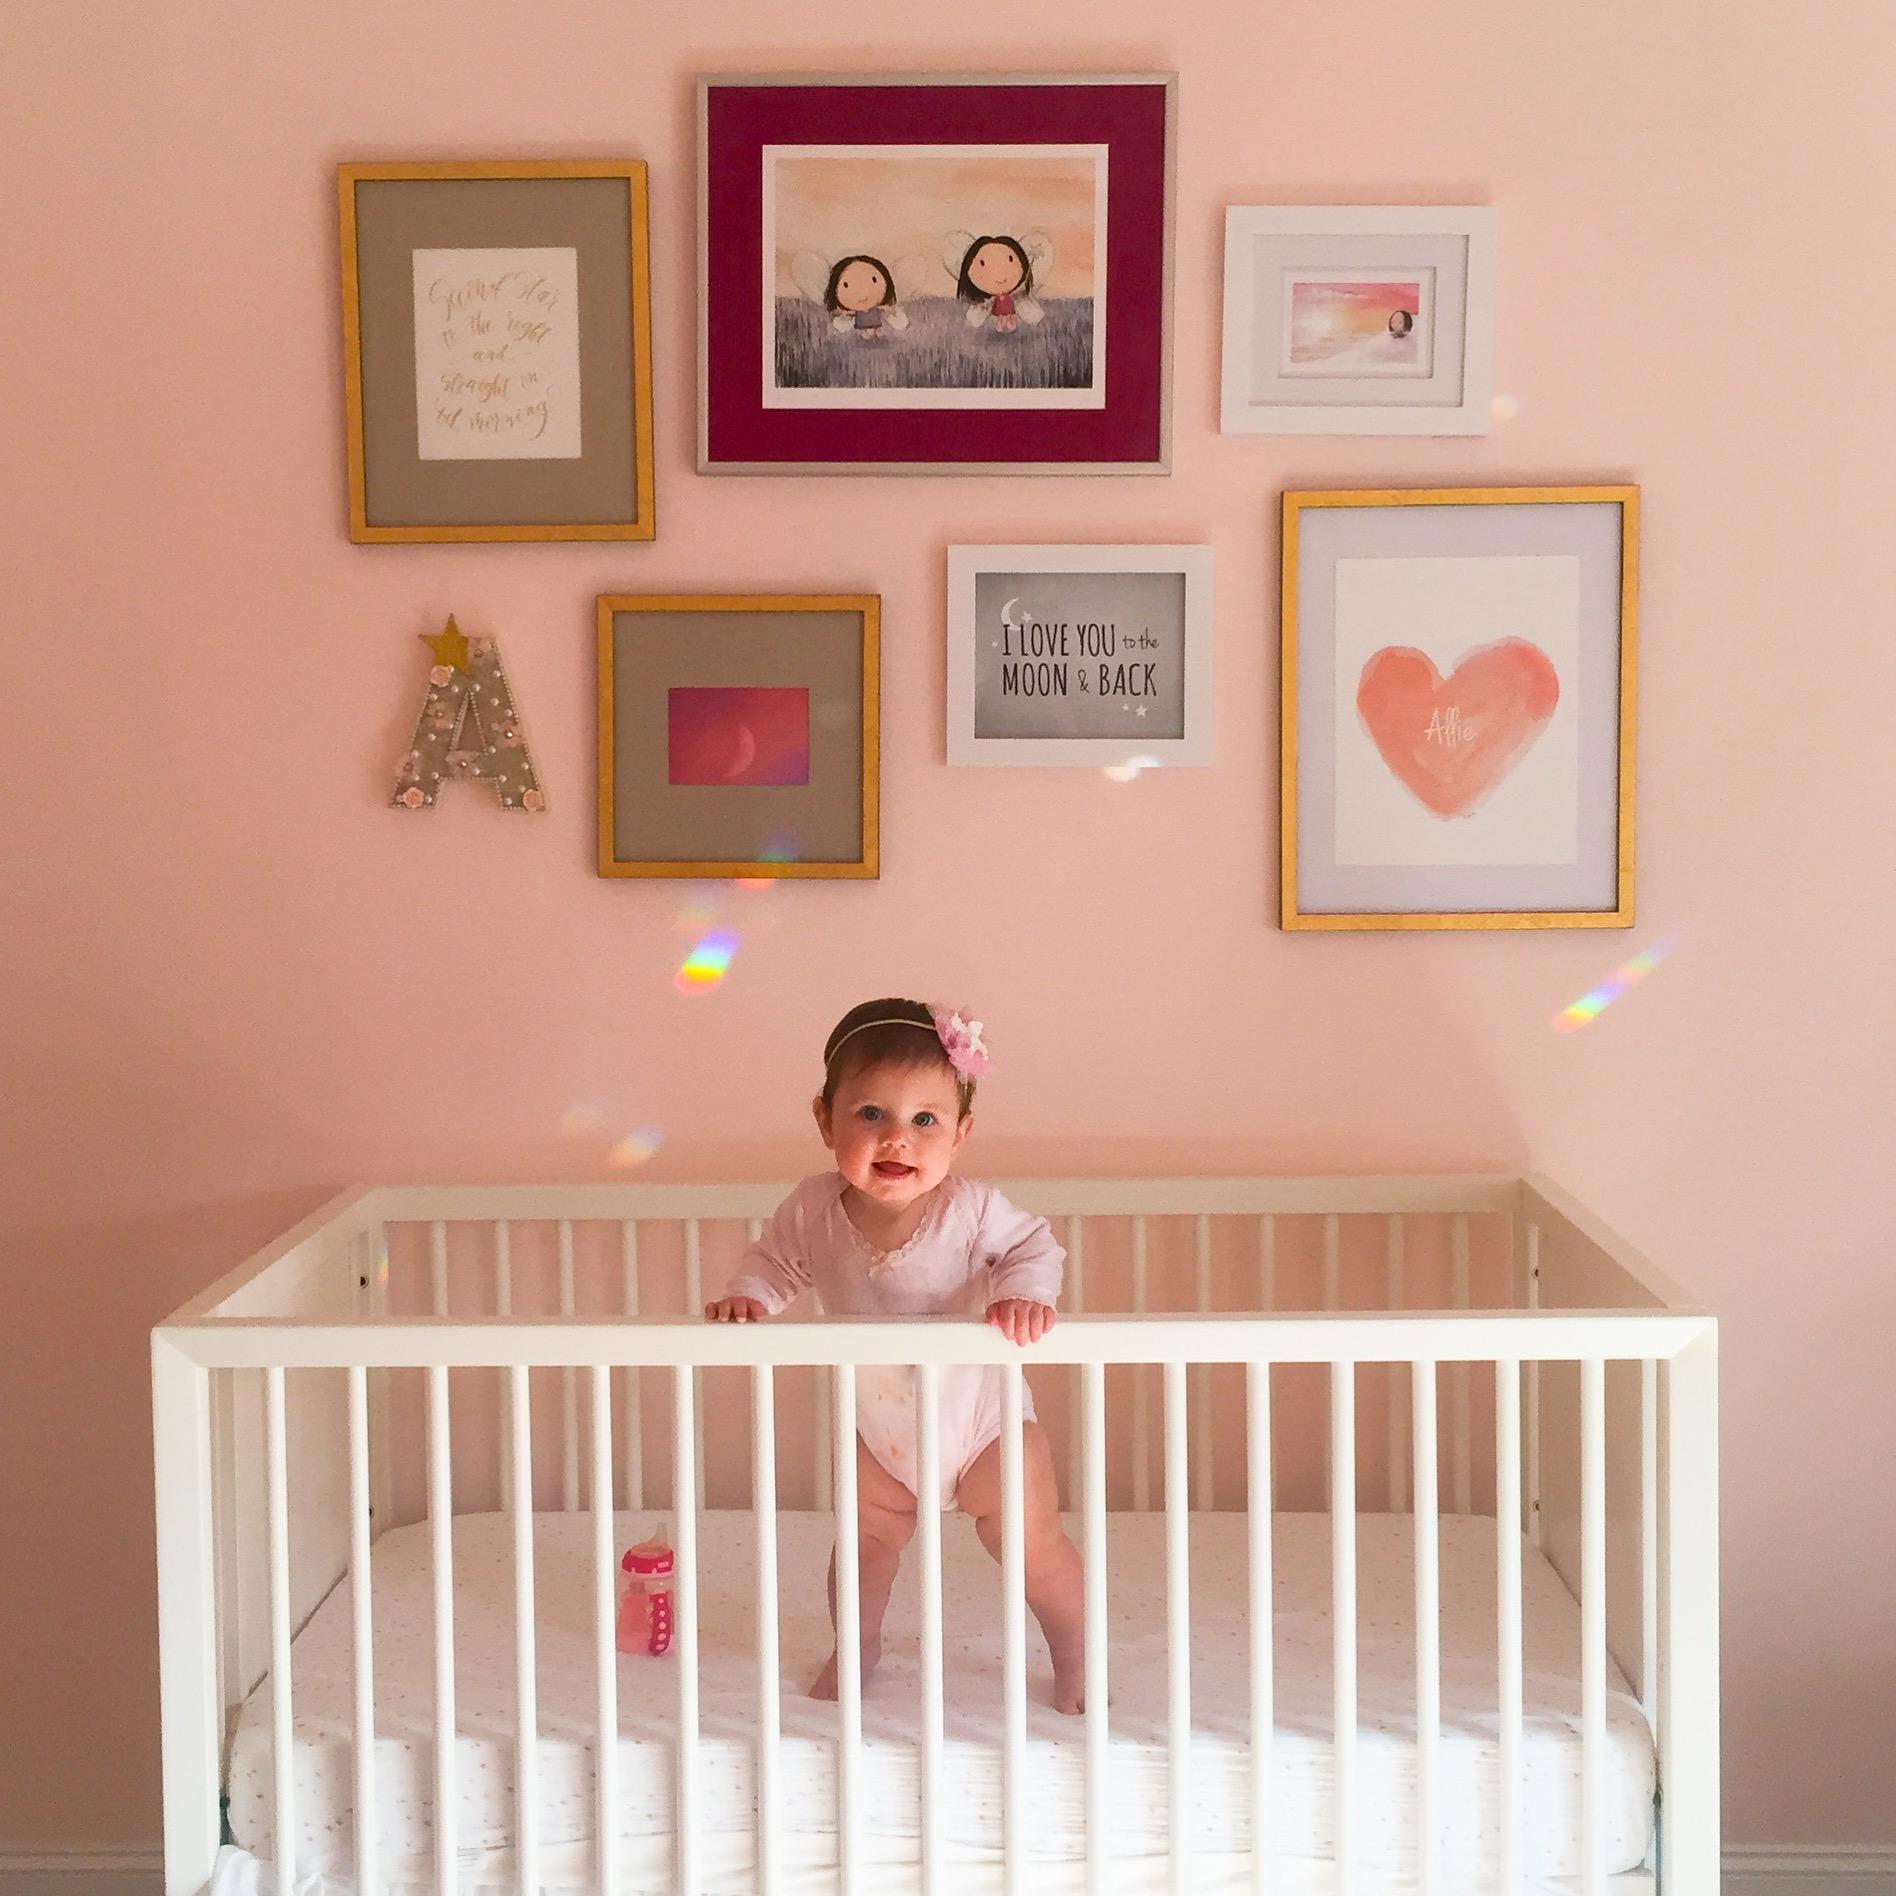 Dreamy Celebrity Nurseries: Allie's Dream Suite Nursery